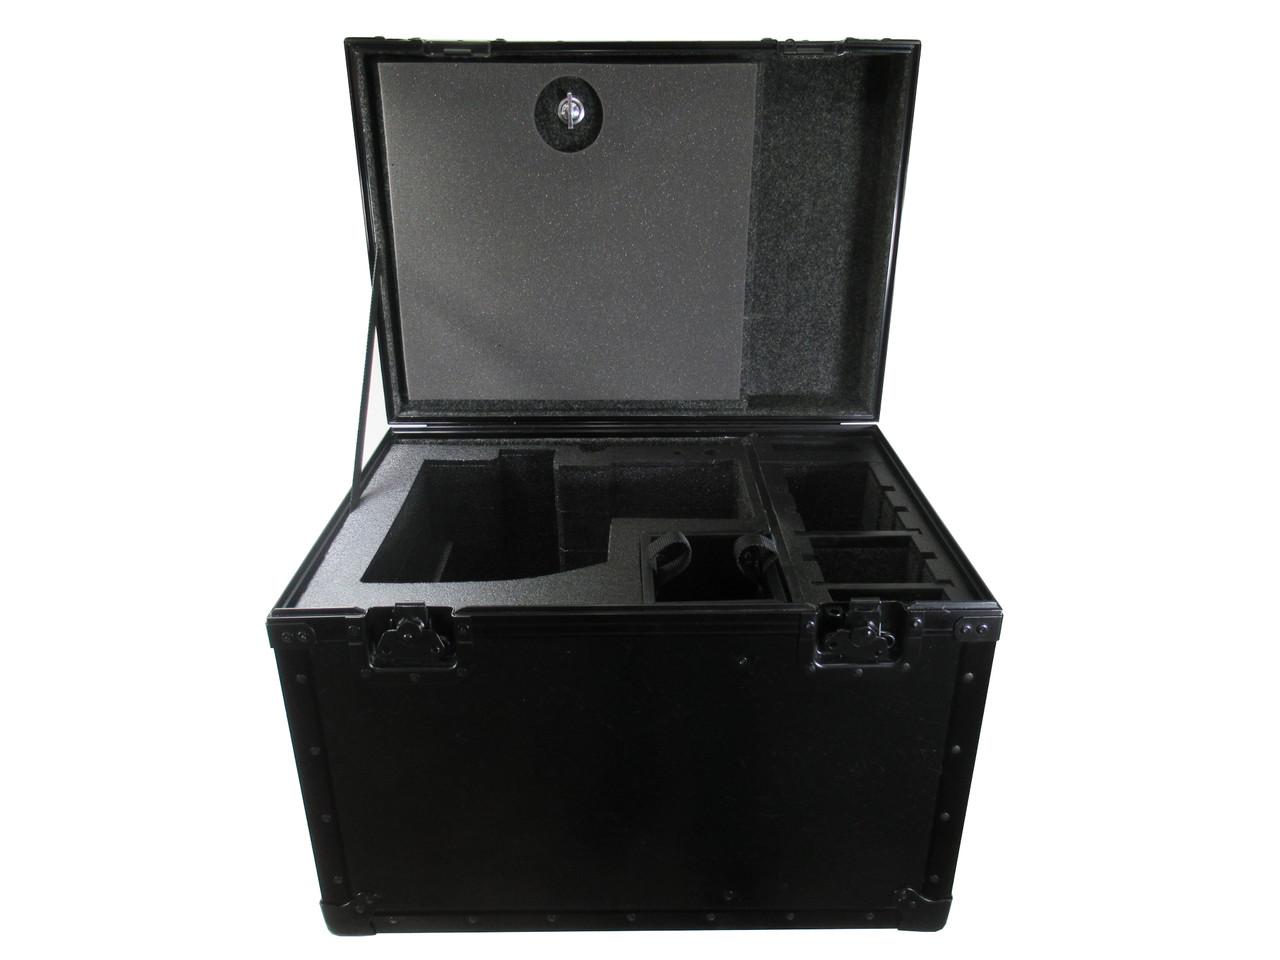 ARRI ALEXA Mini LF Shipping Case